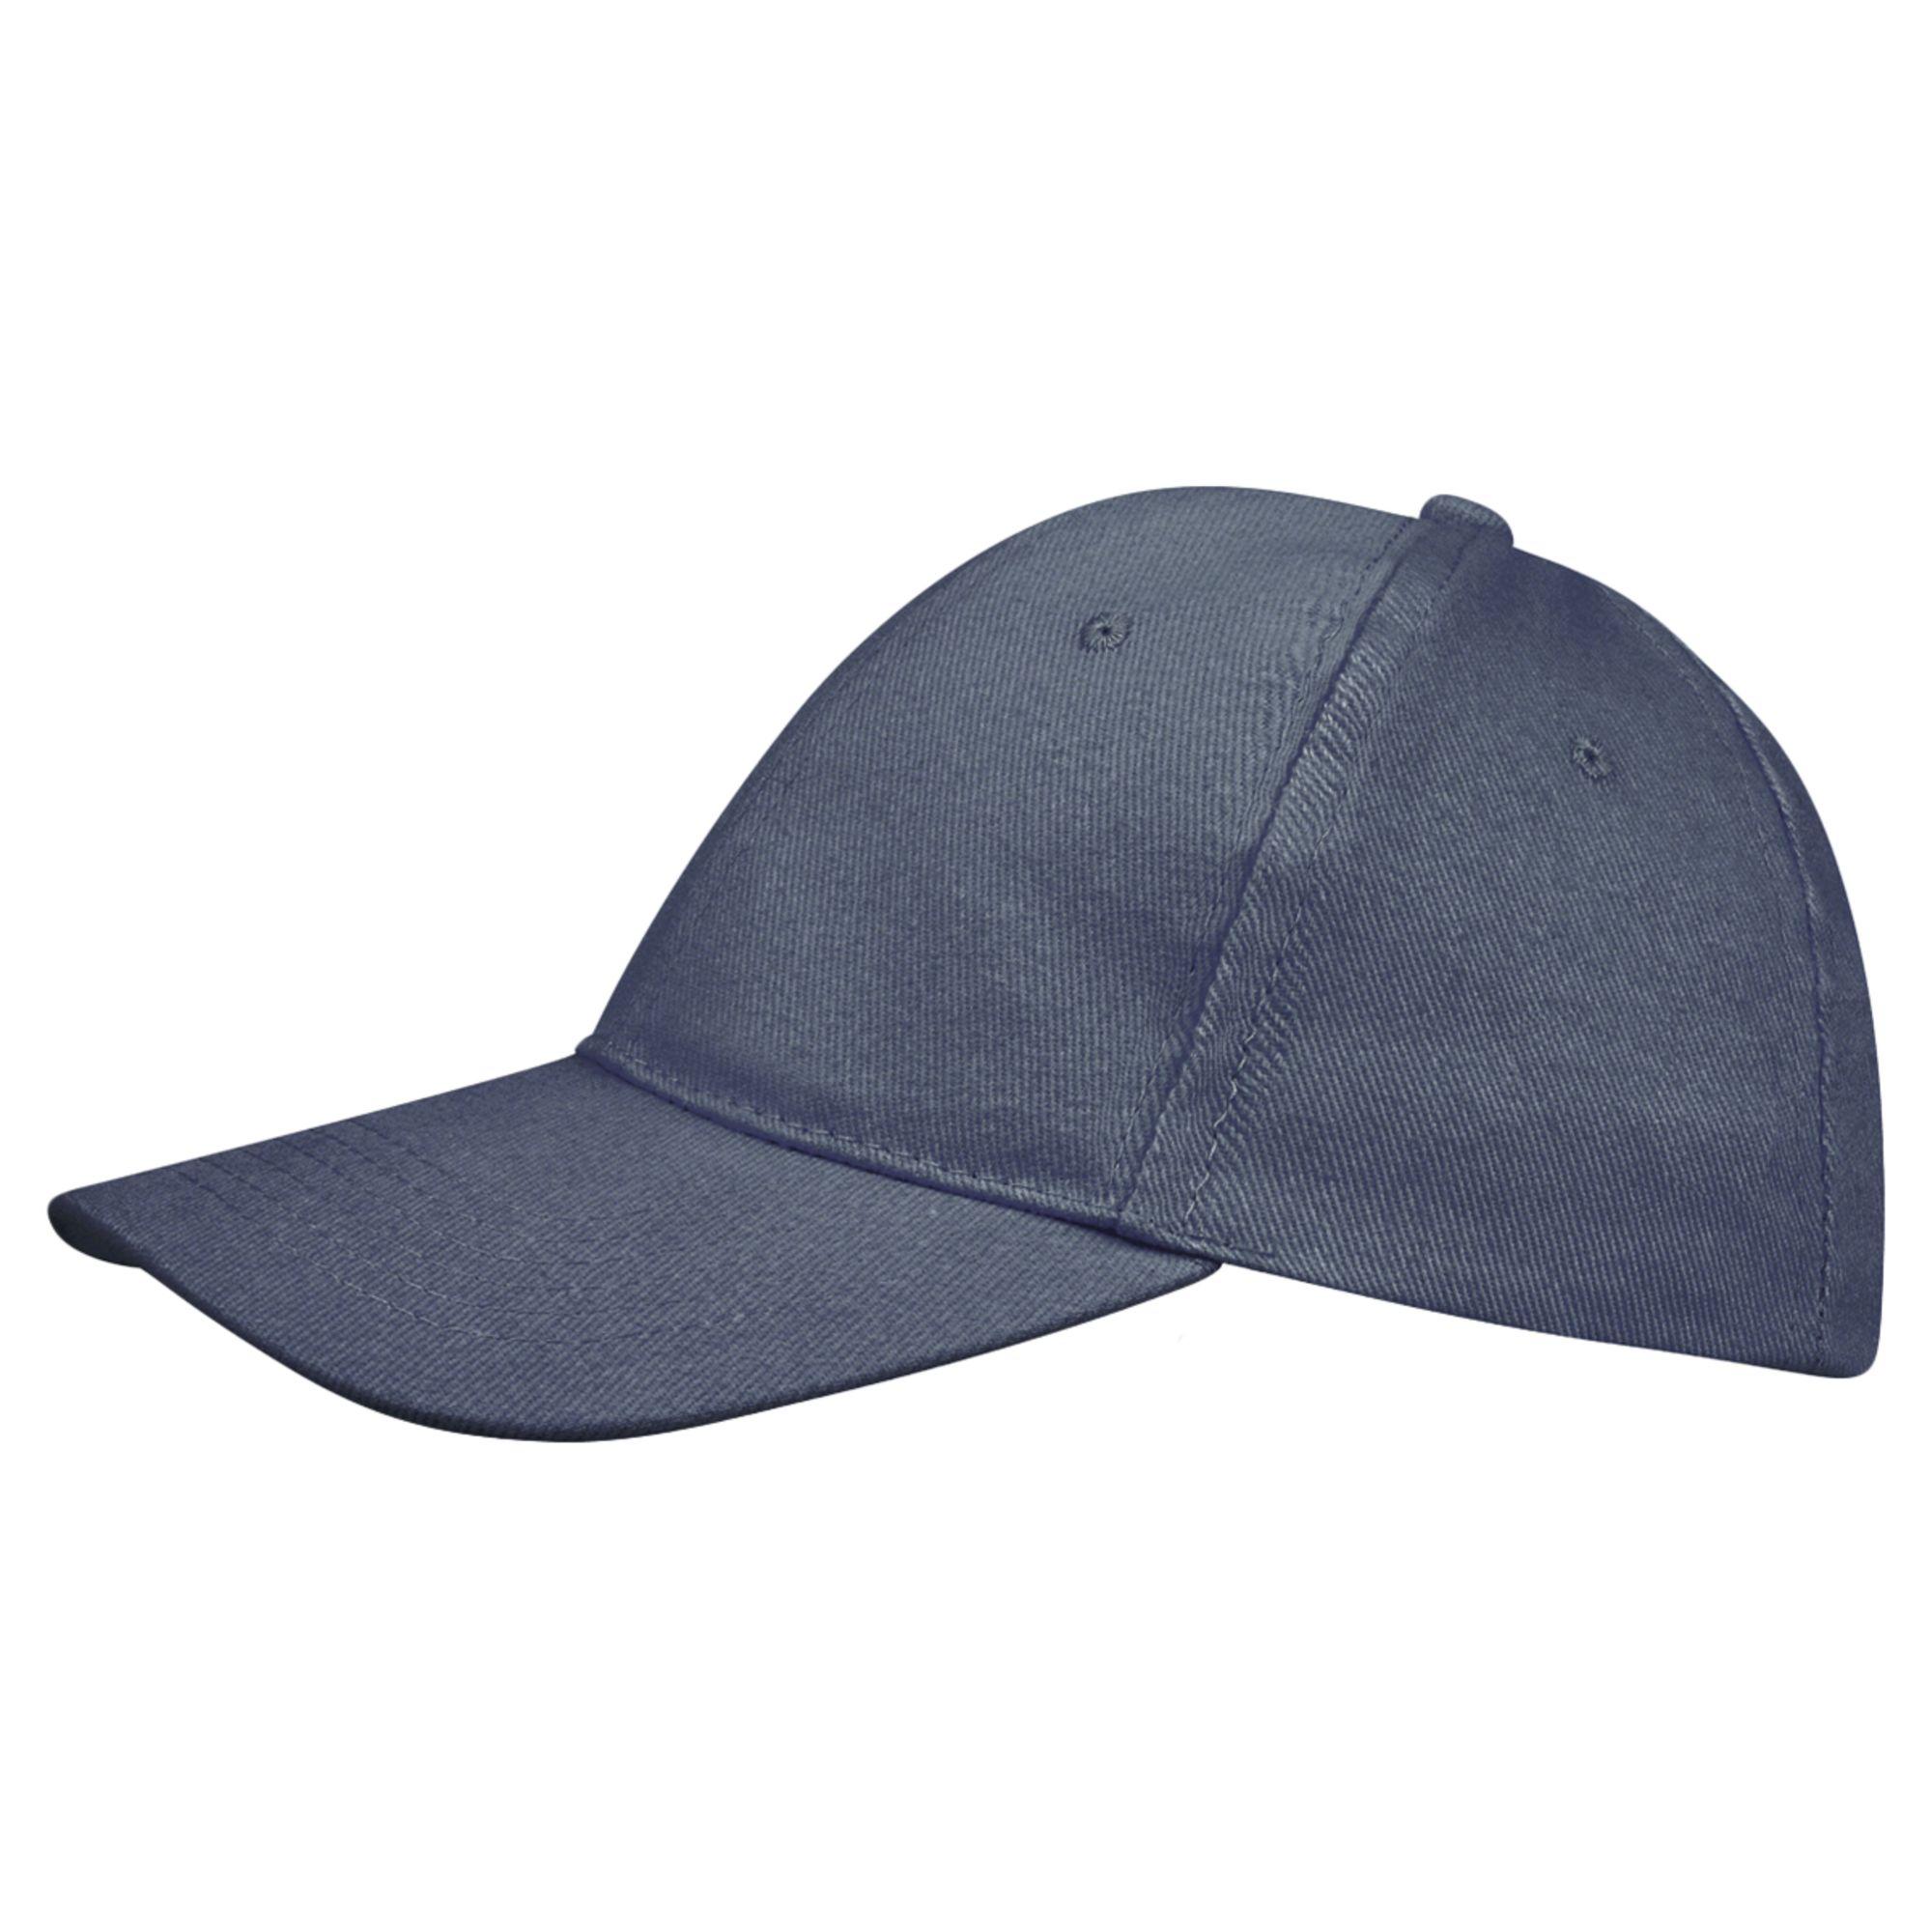 Бейсболка BUFFALO, синяя (джинс)